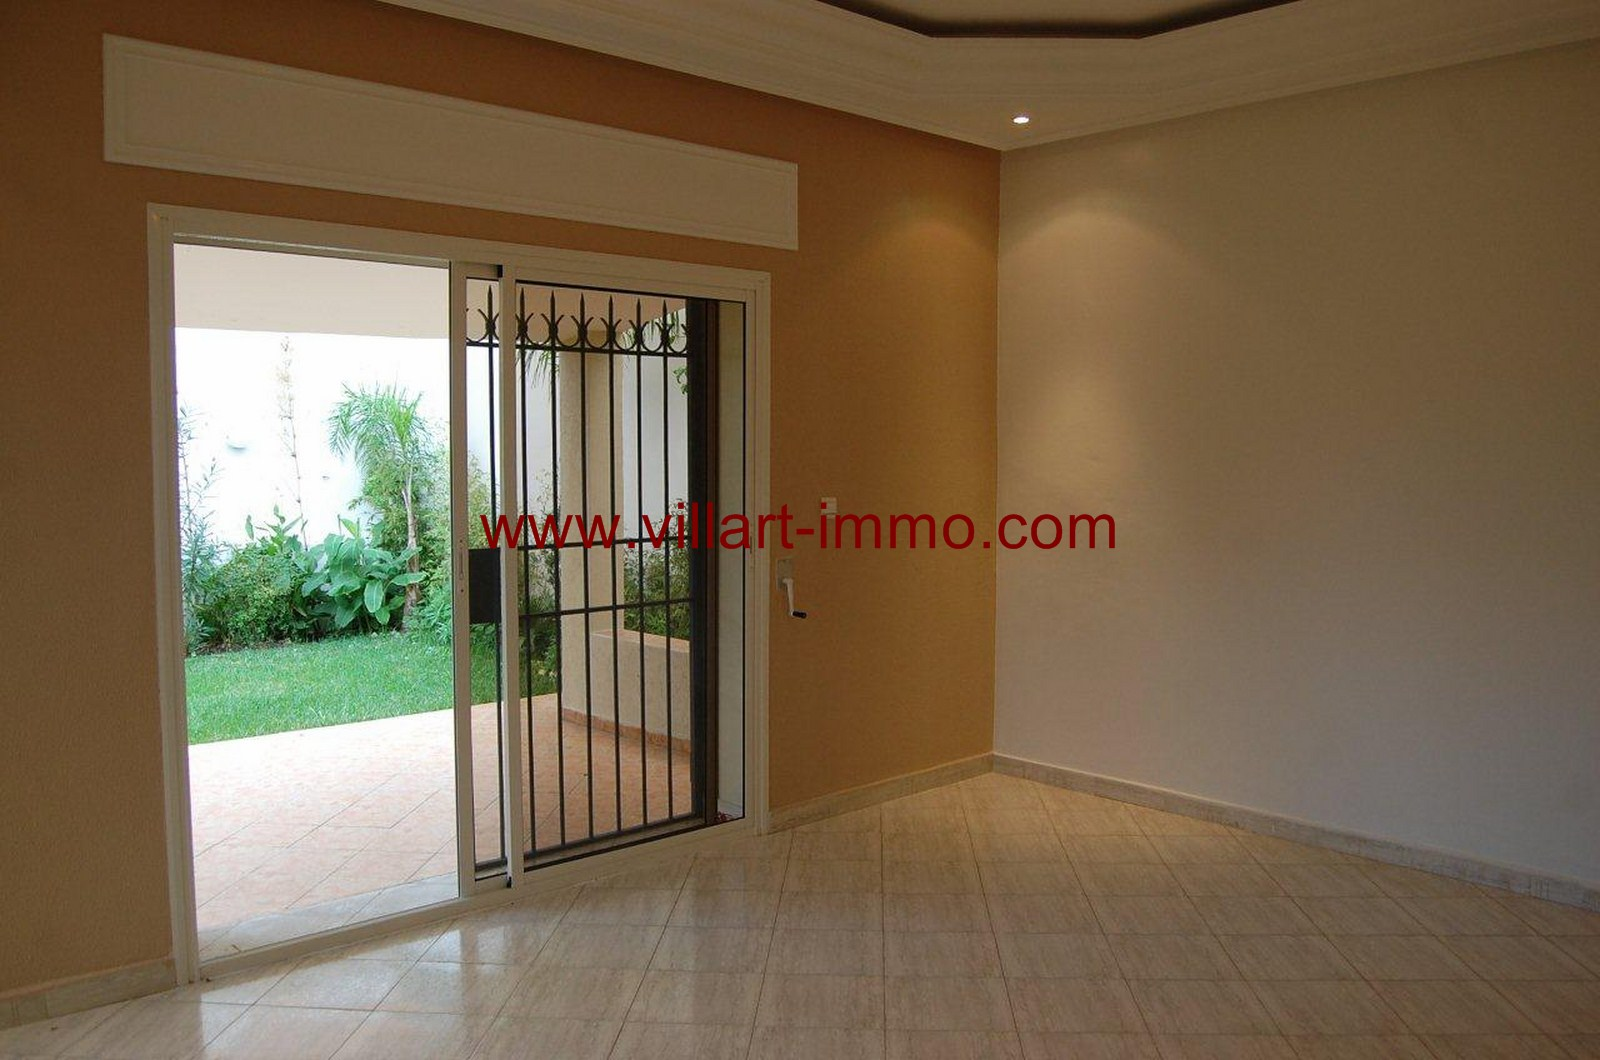 9-vente-villa-tanger-malabata-chambre-3-va362-villart-immo